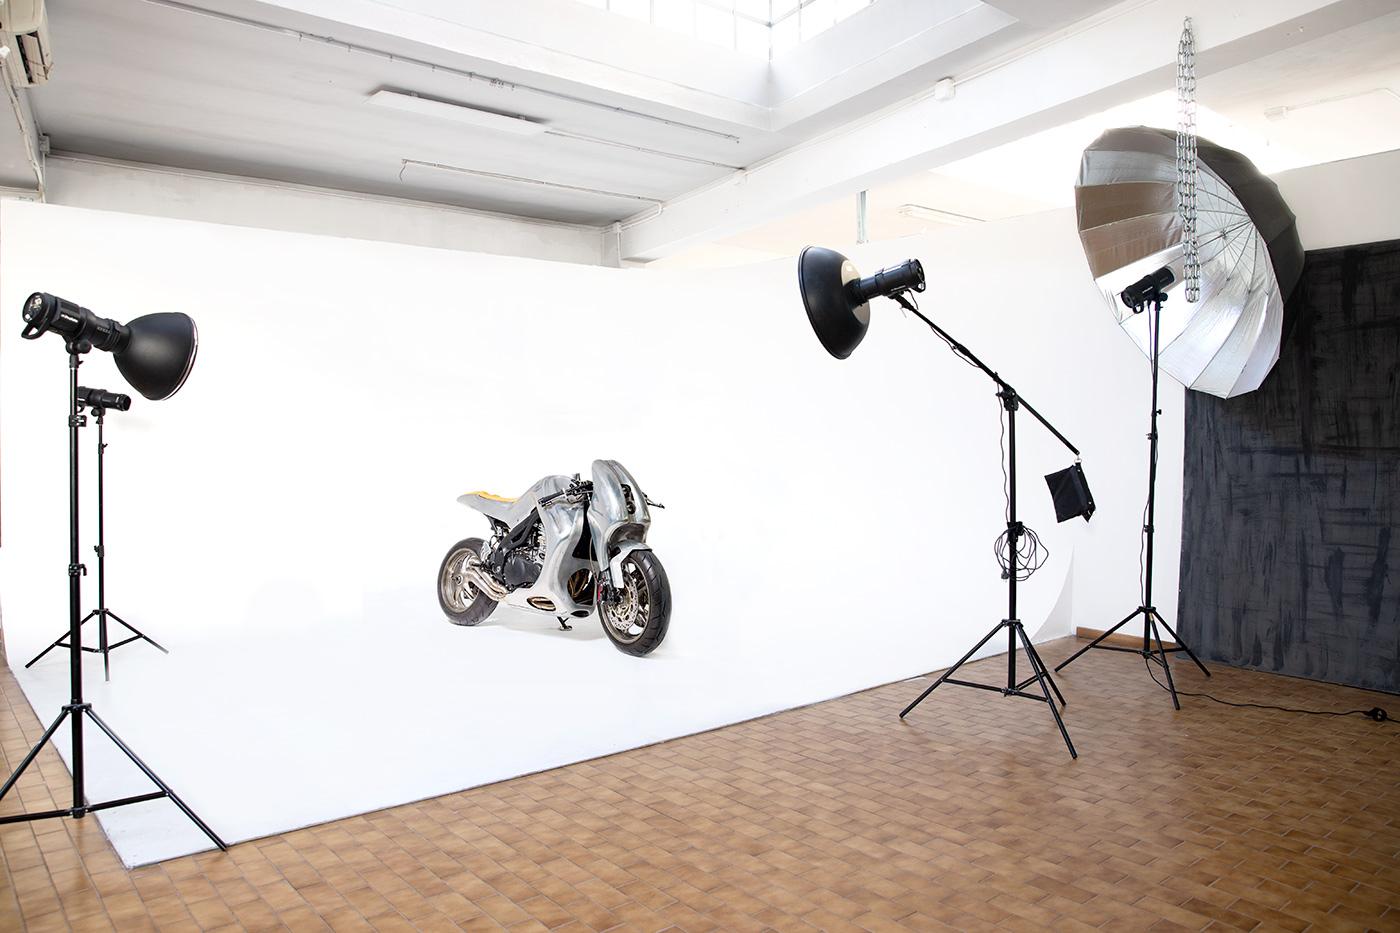 Studio fotografico Torino NST Photostudio Limbo fotografico